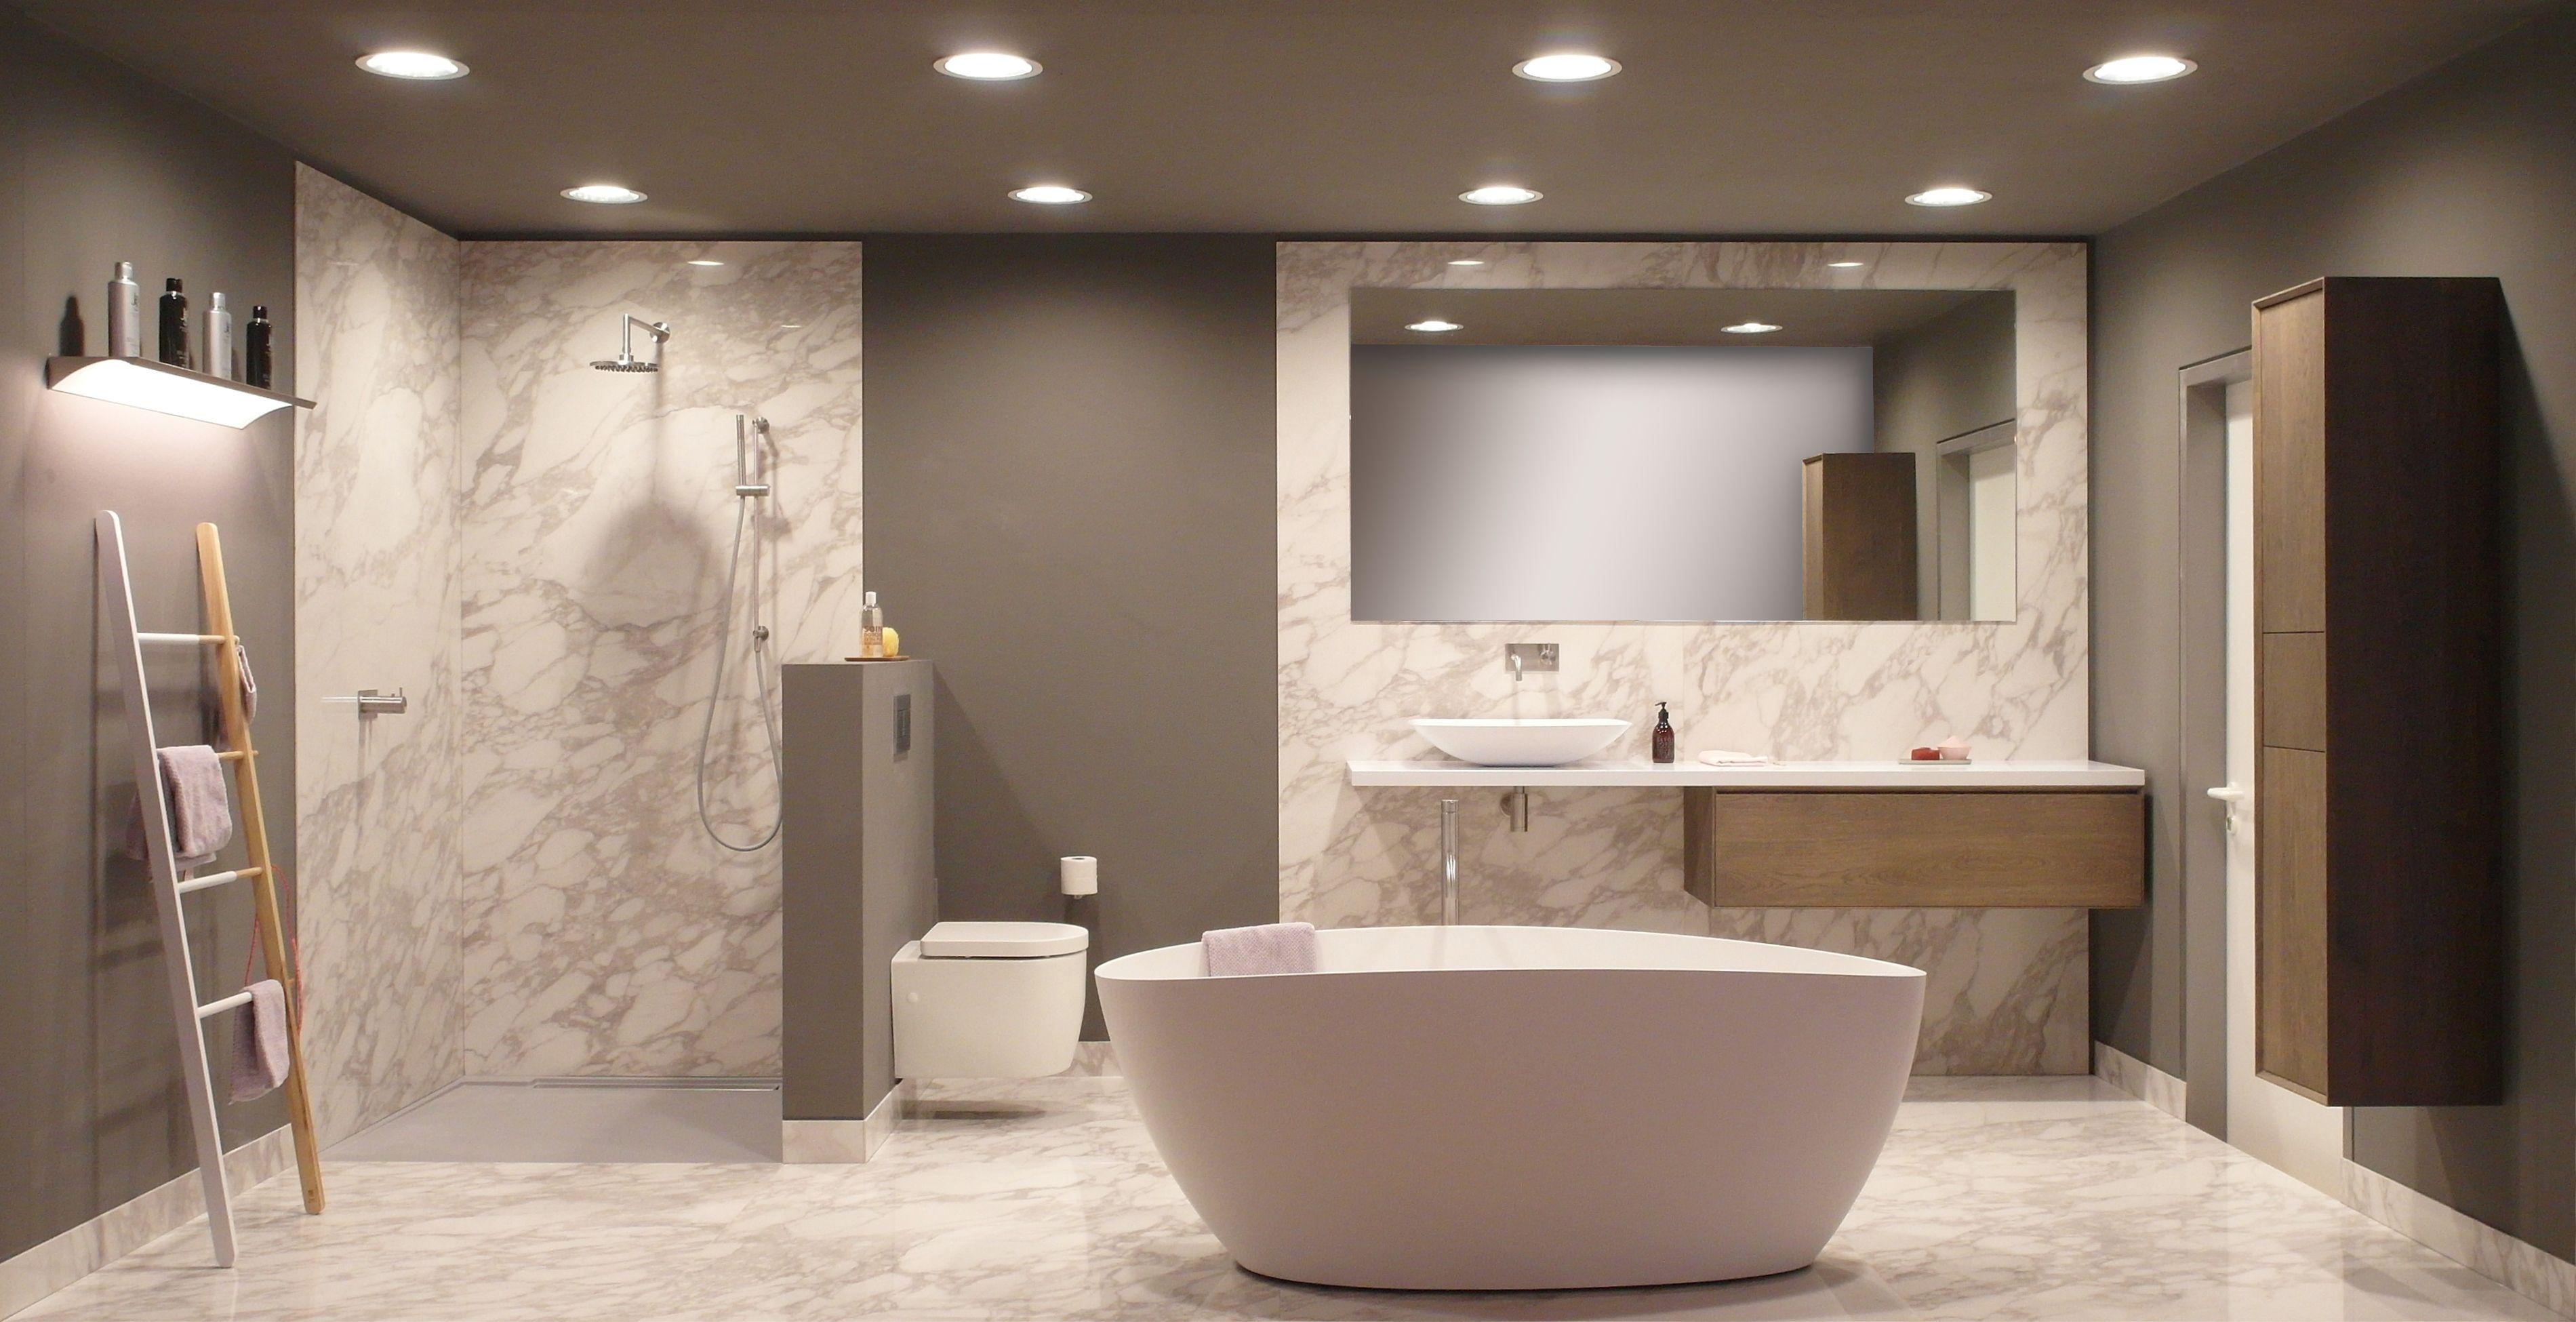 marmer badkamer   Badkamer   Pinterest   Marbles